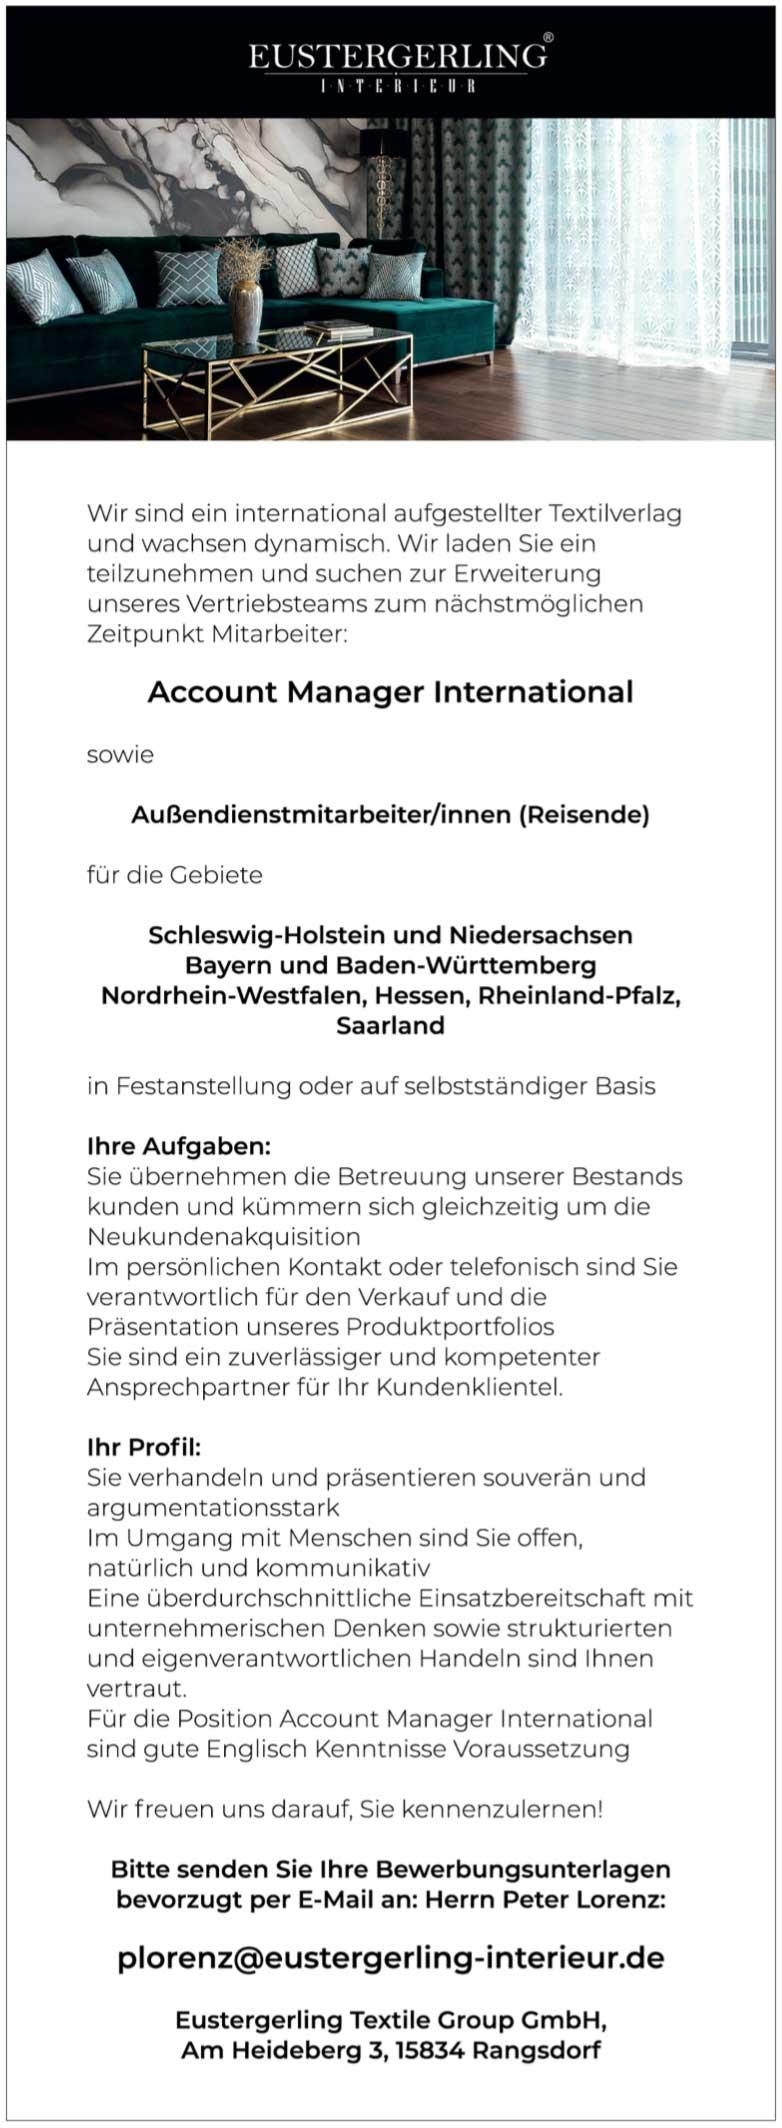 Account Manager International in Textilverlag